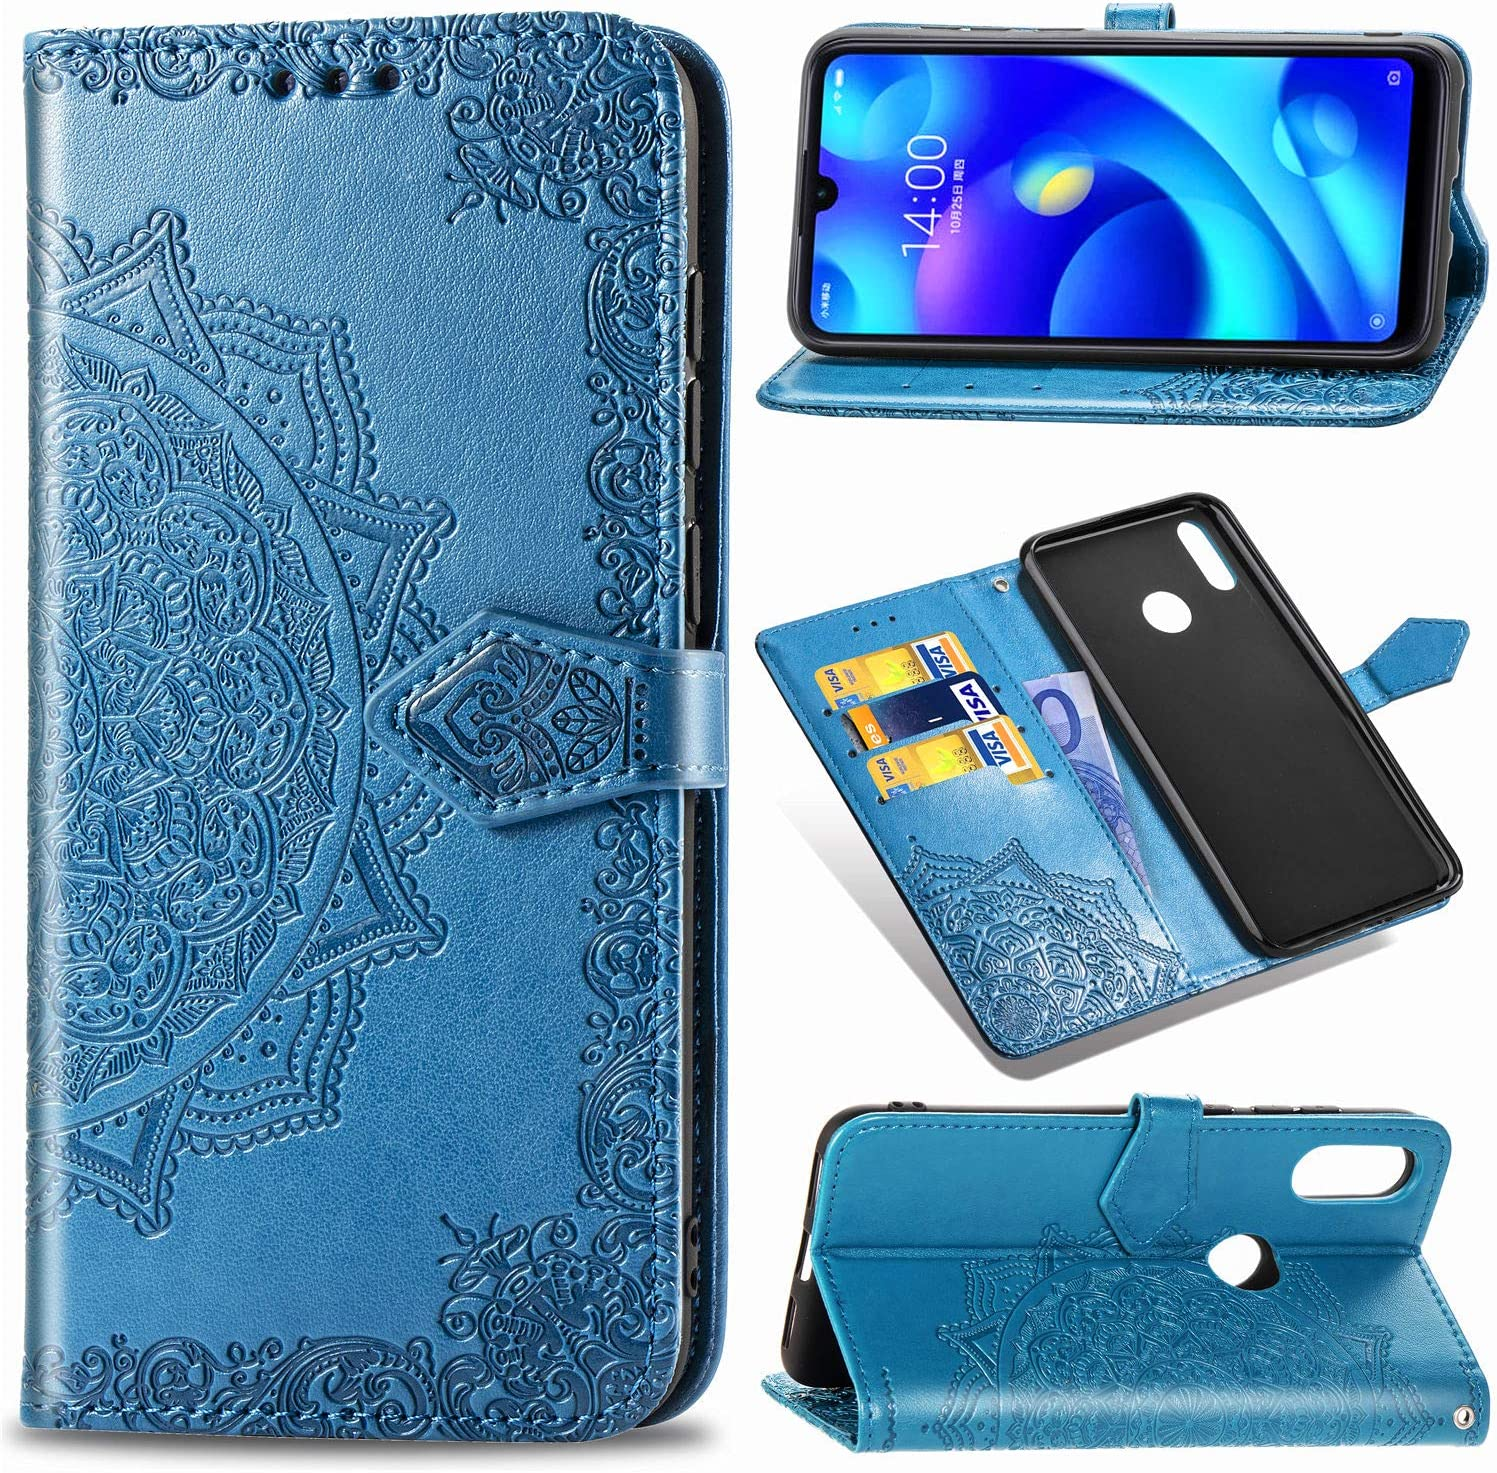 Funda para Xiaomi Mi Play, Carcasa Libro con Tapa Flip Case Antigolpes Golpes Cartera PU Cuero Suave Soporte con Correa Cordel - Mandala Azul